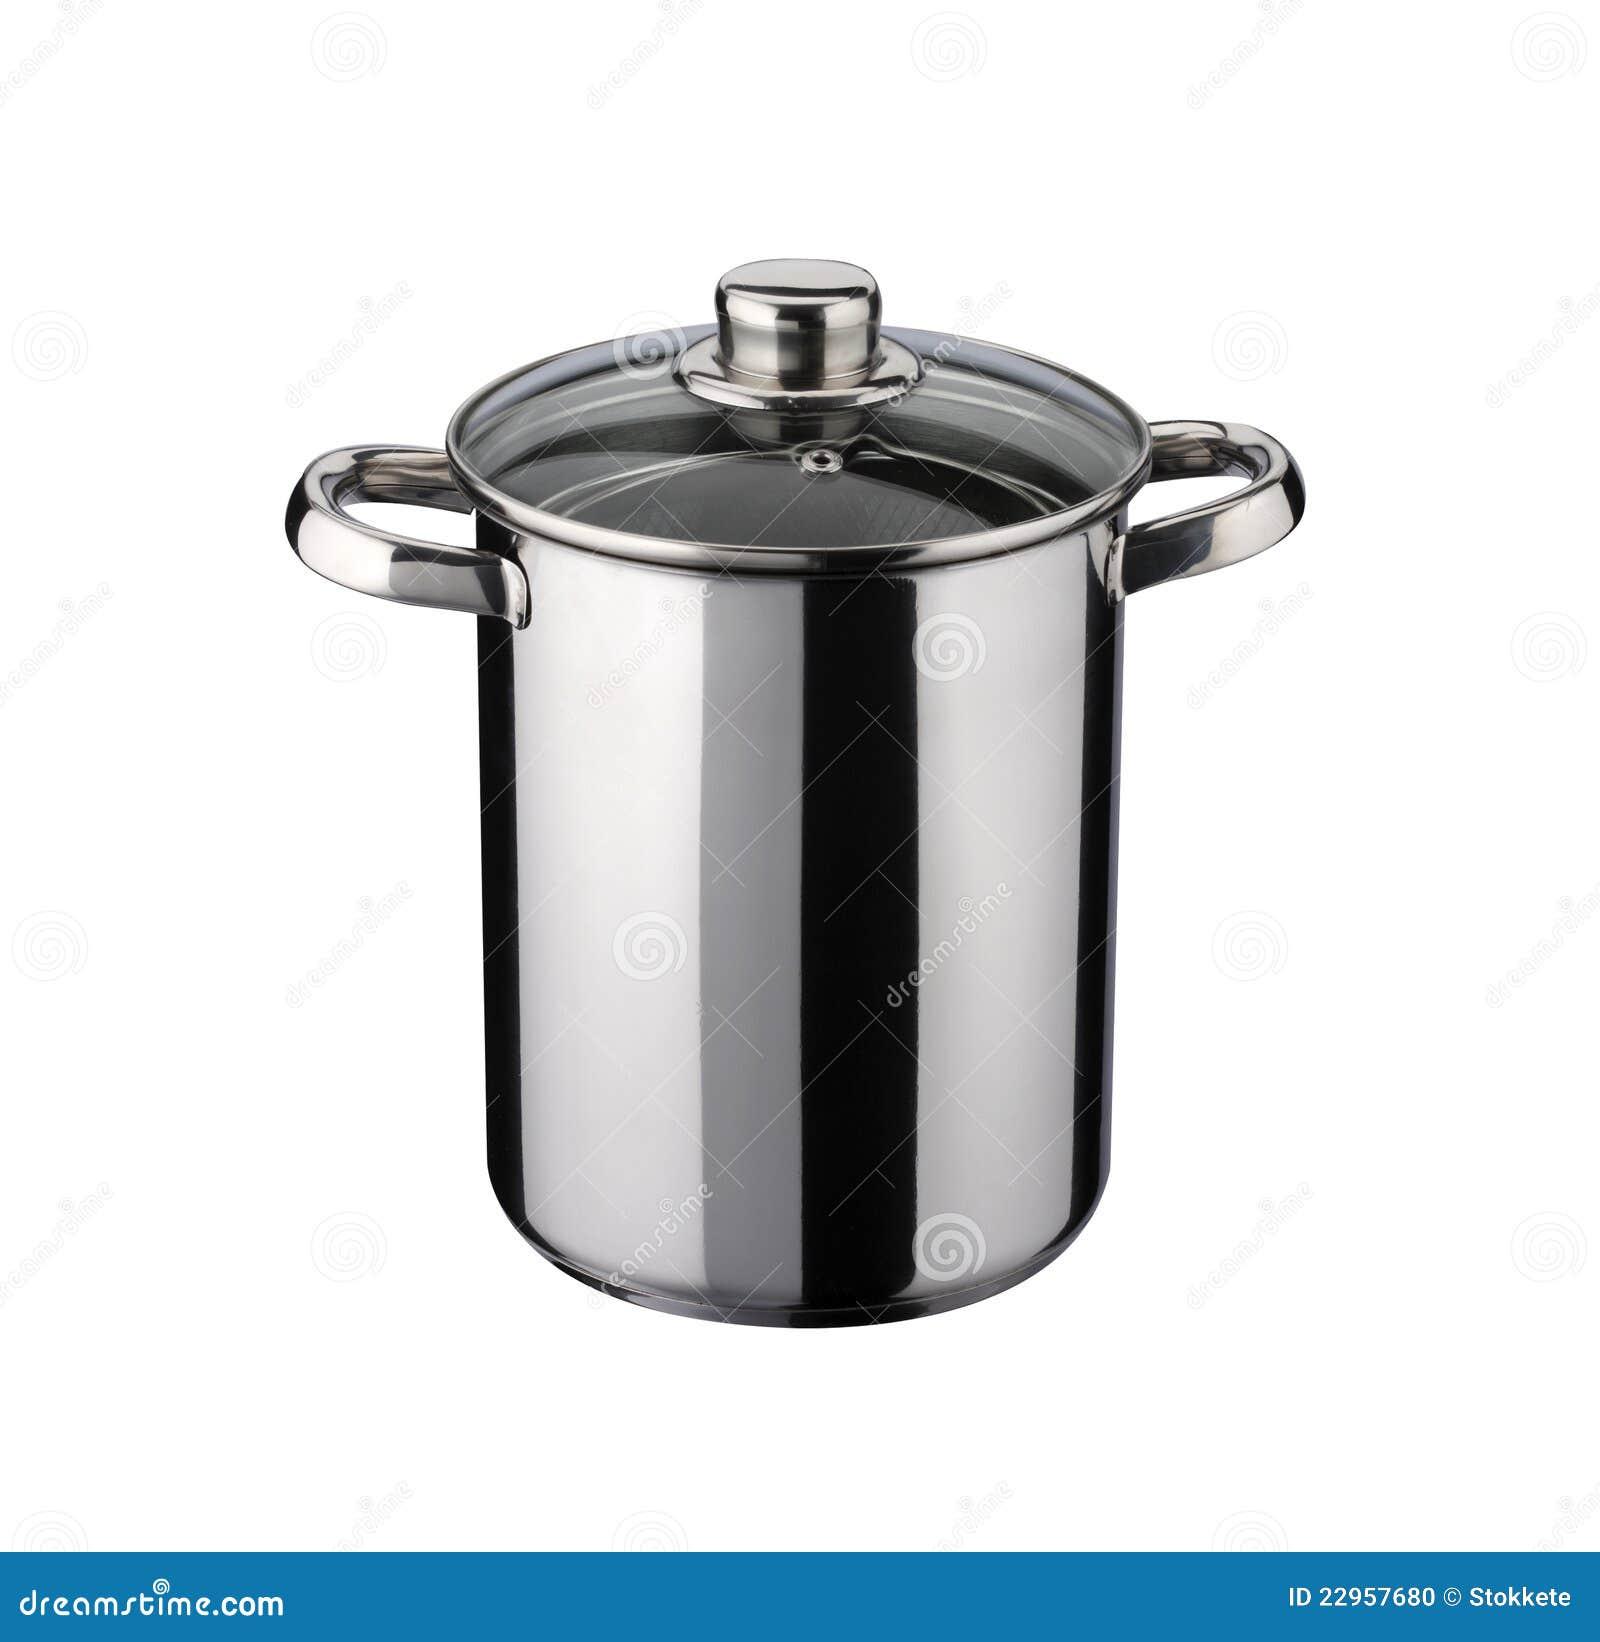 Kitchen Utensil:pot For Cook The Spaghetti Stock Photo - Image of ...